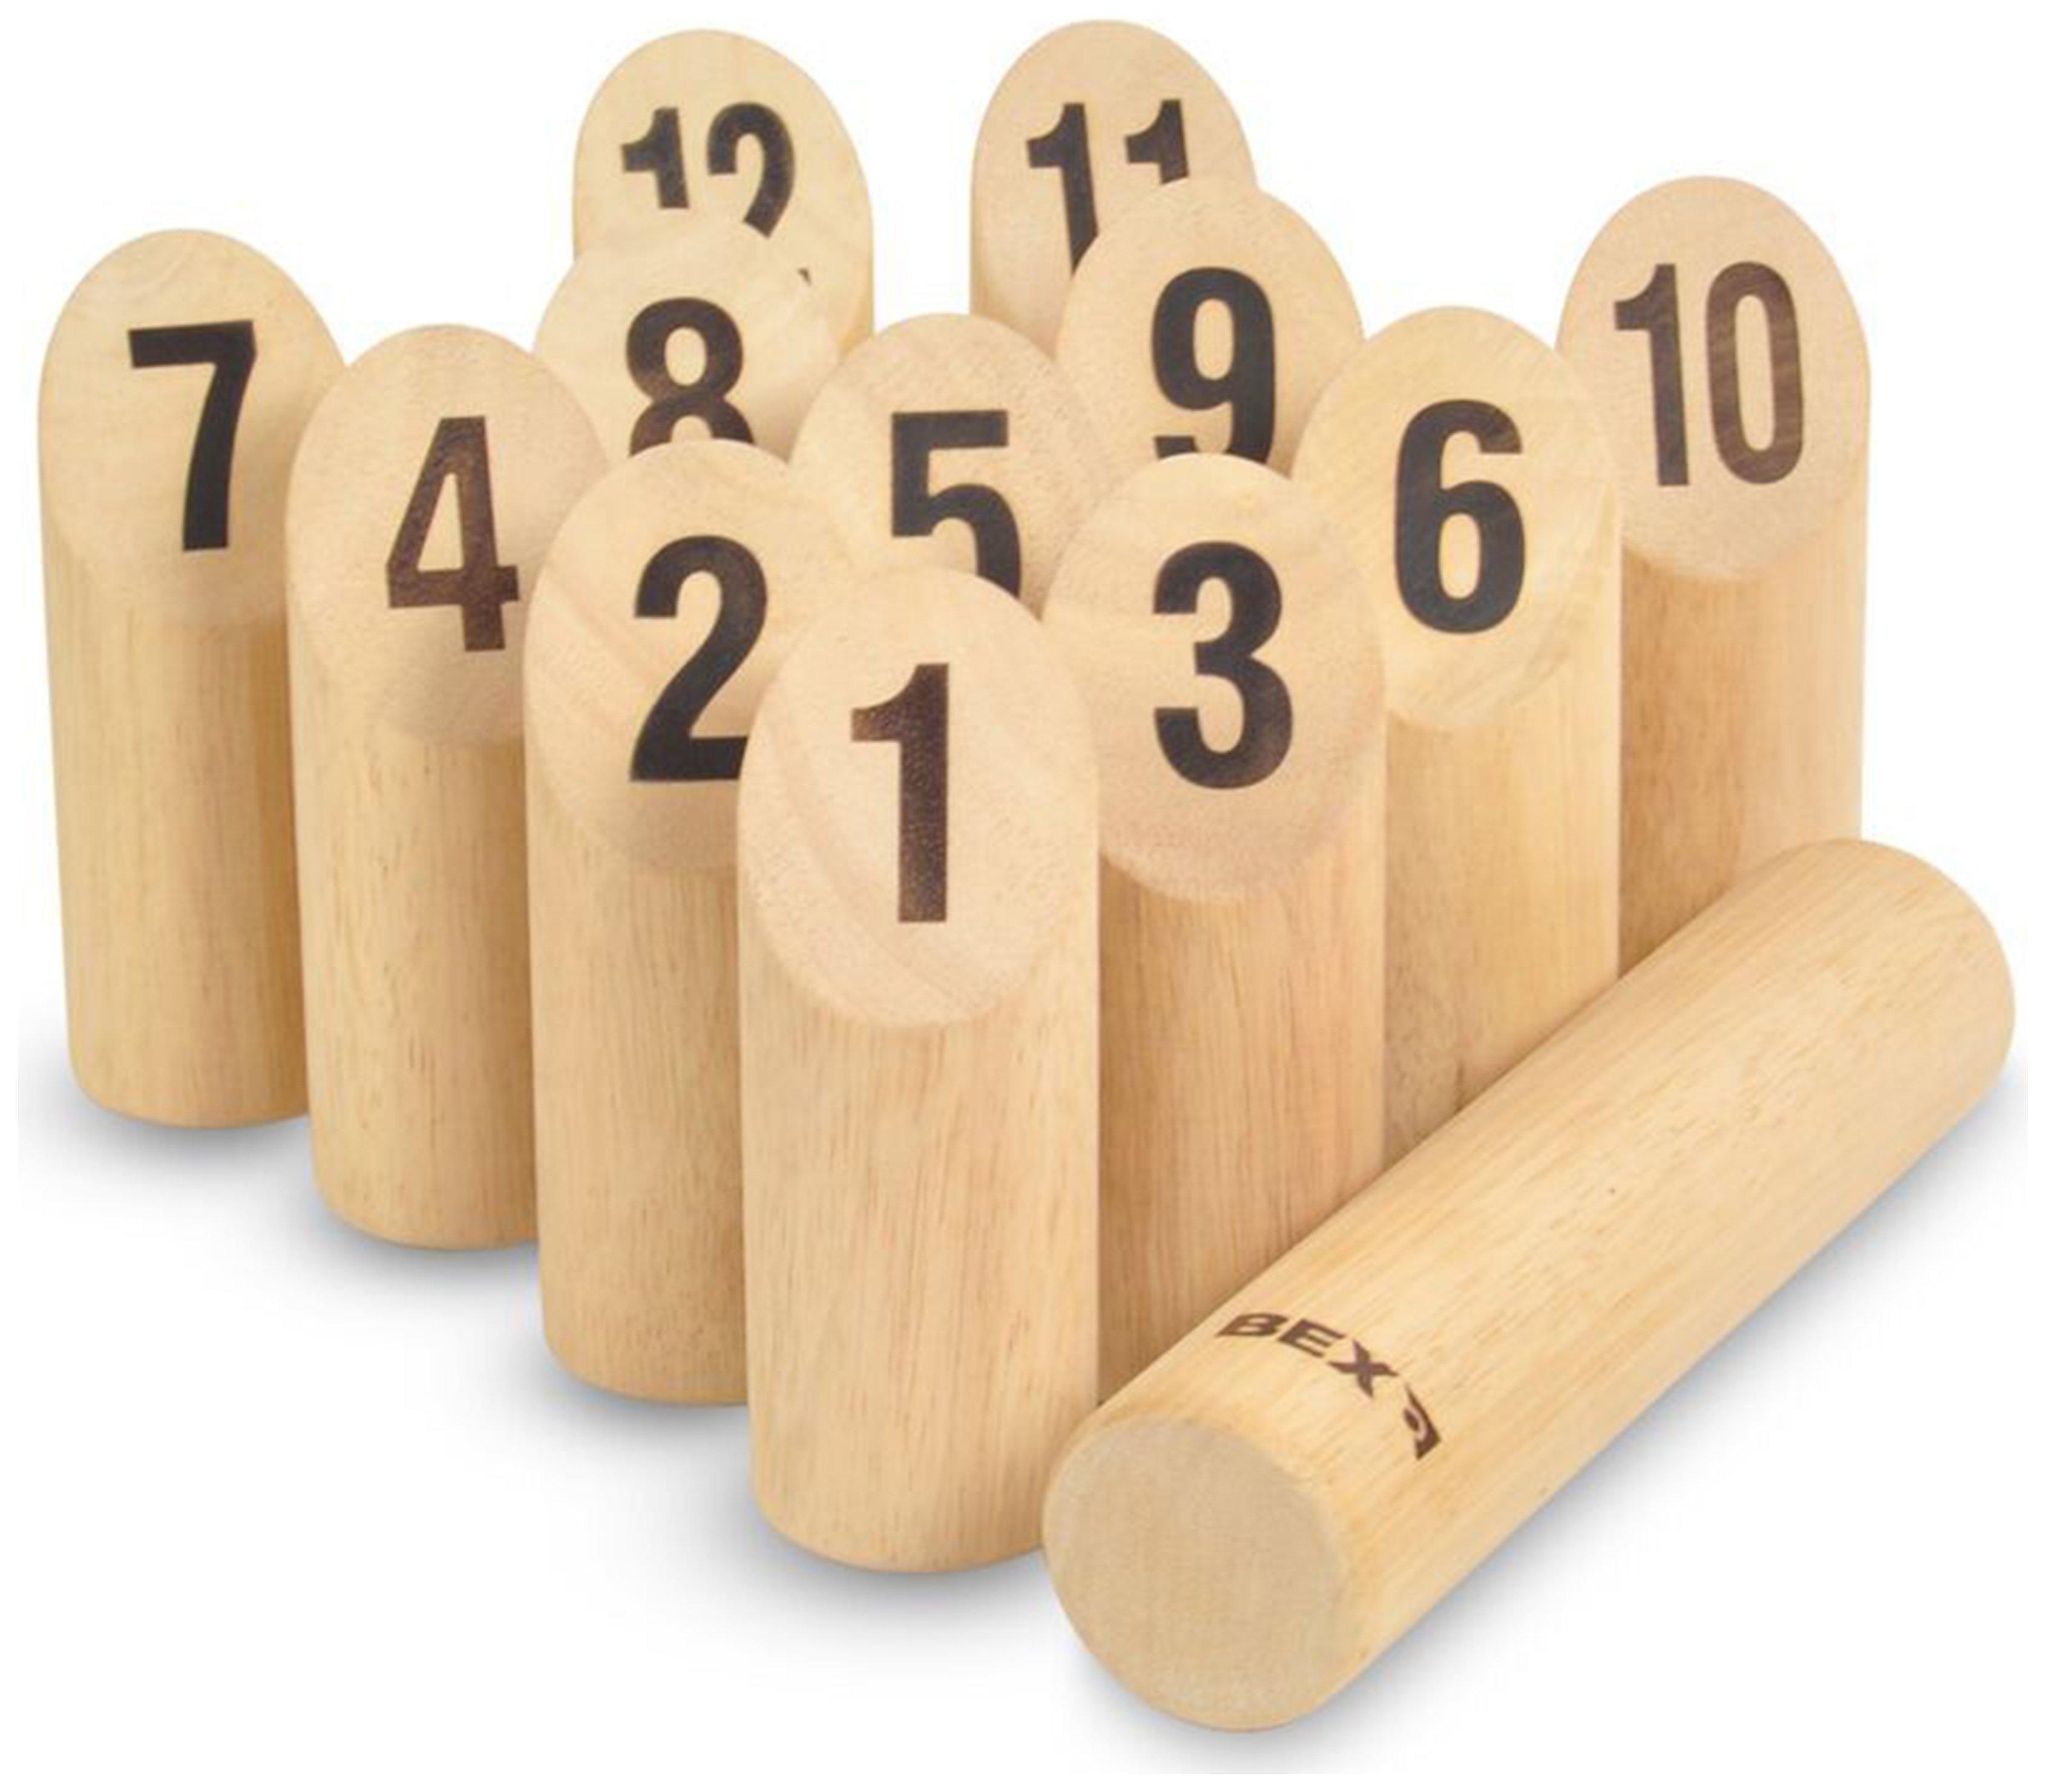 Image of Bex Number Kubb Original Game.